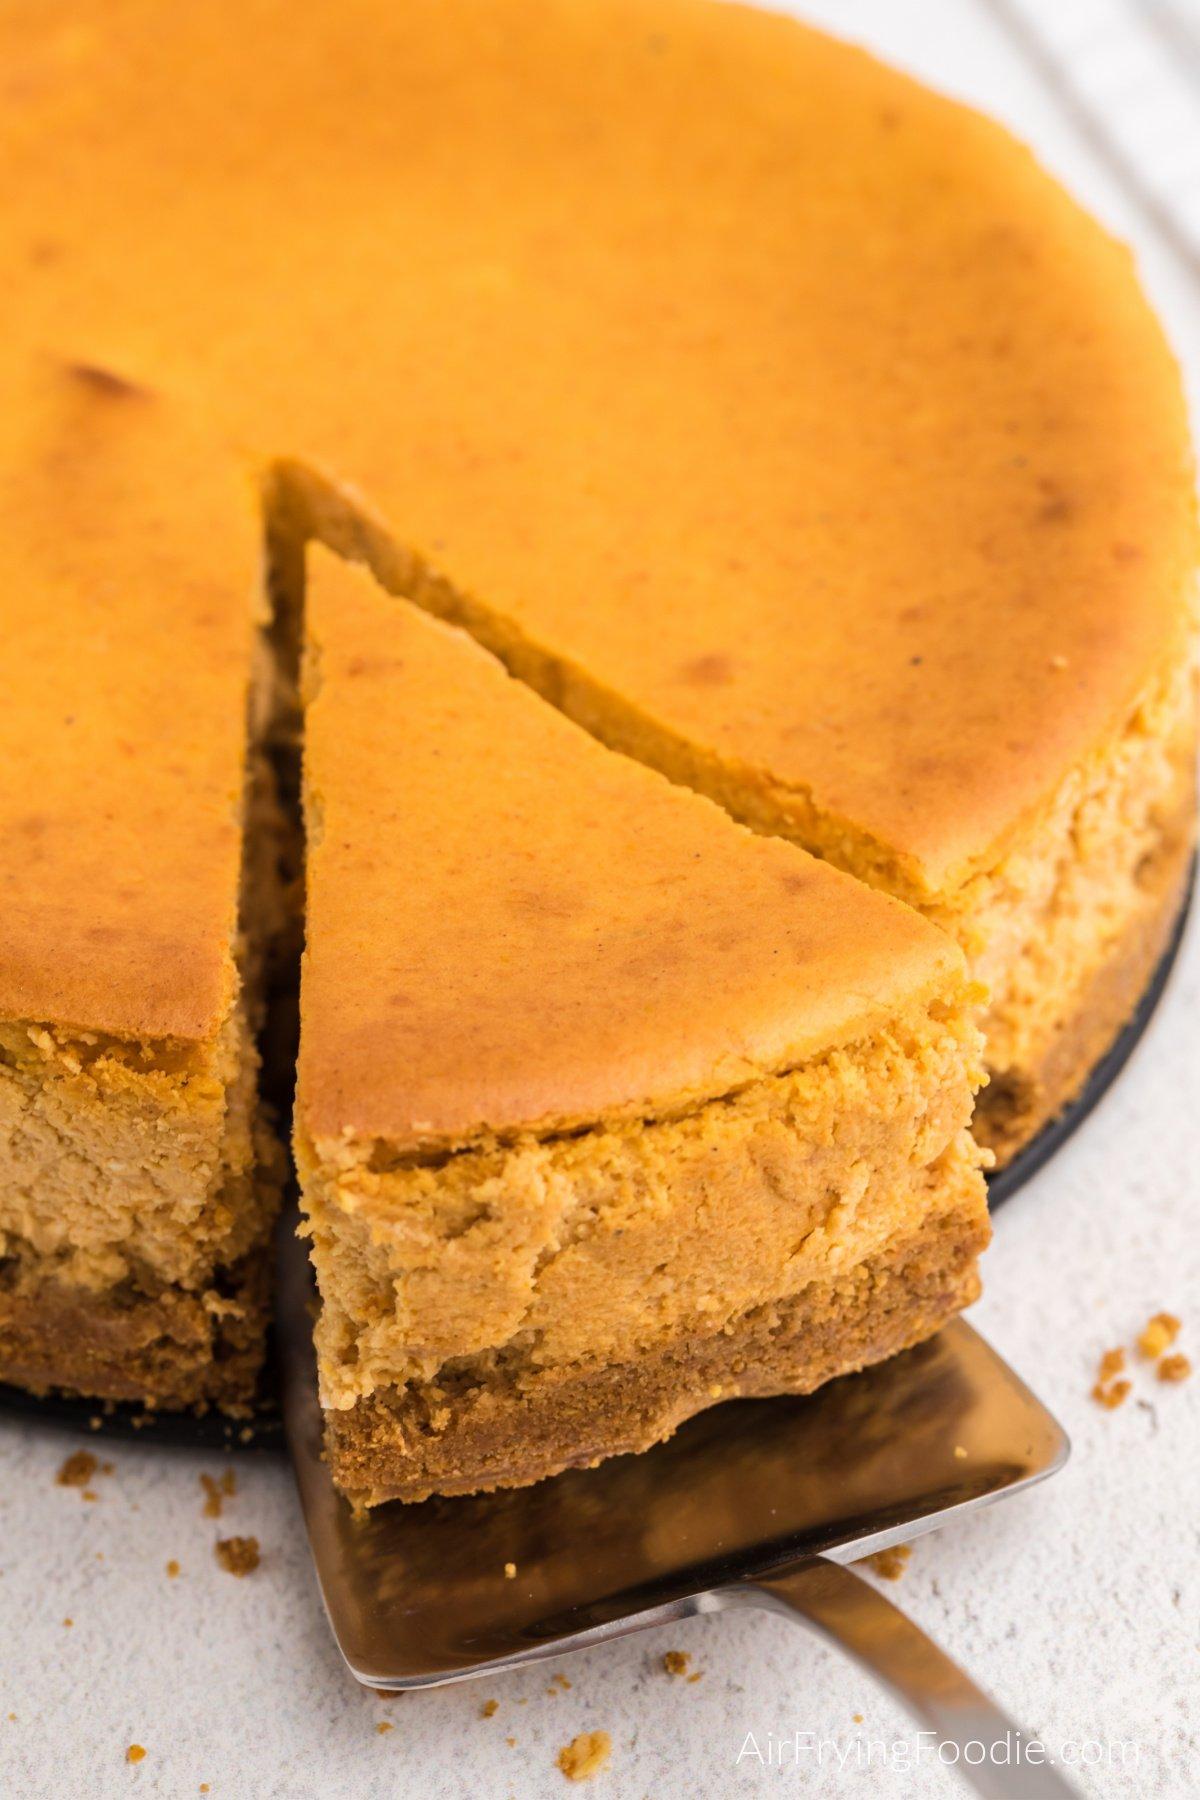 Slicing the pumpkin cheesecake to serve.